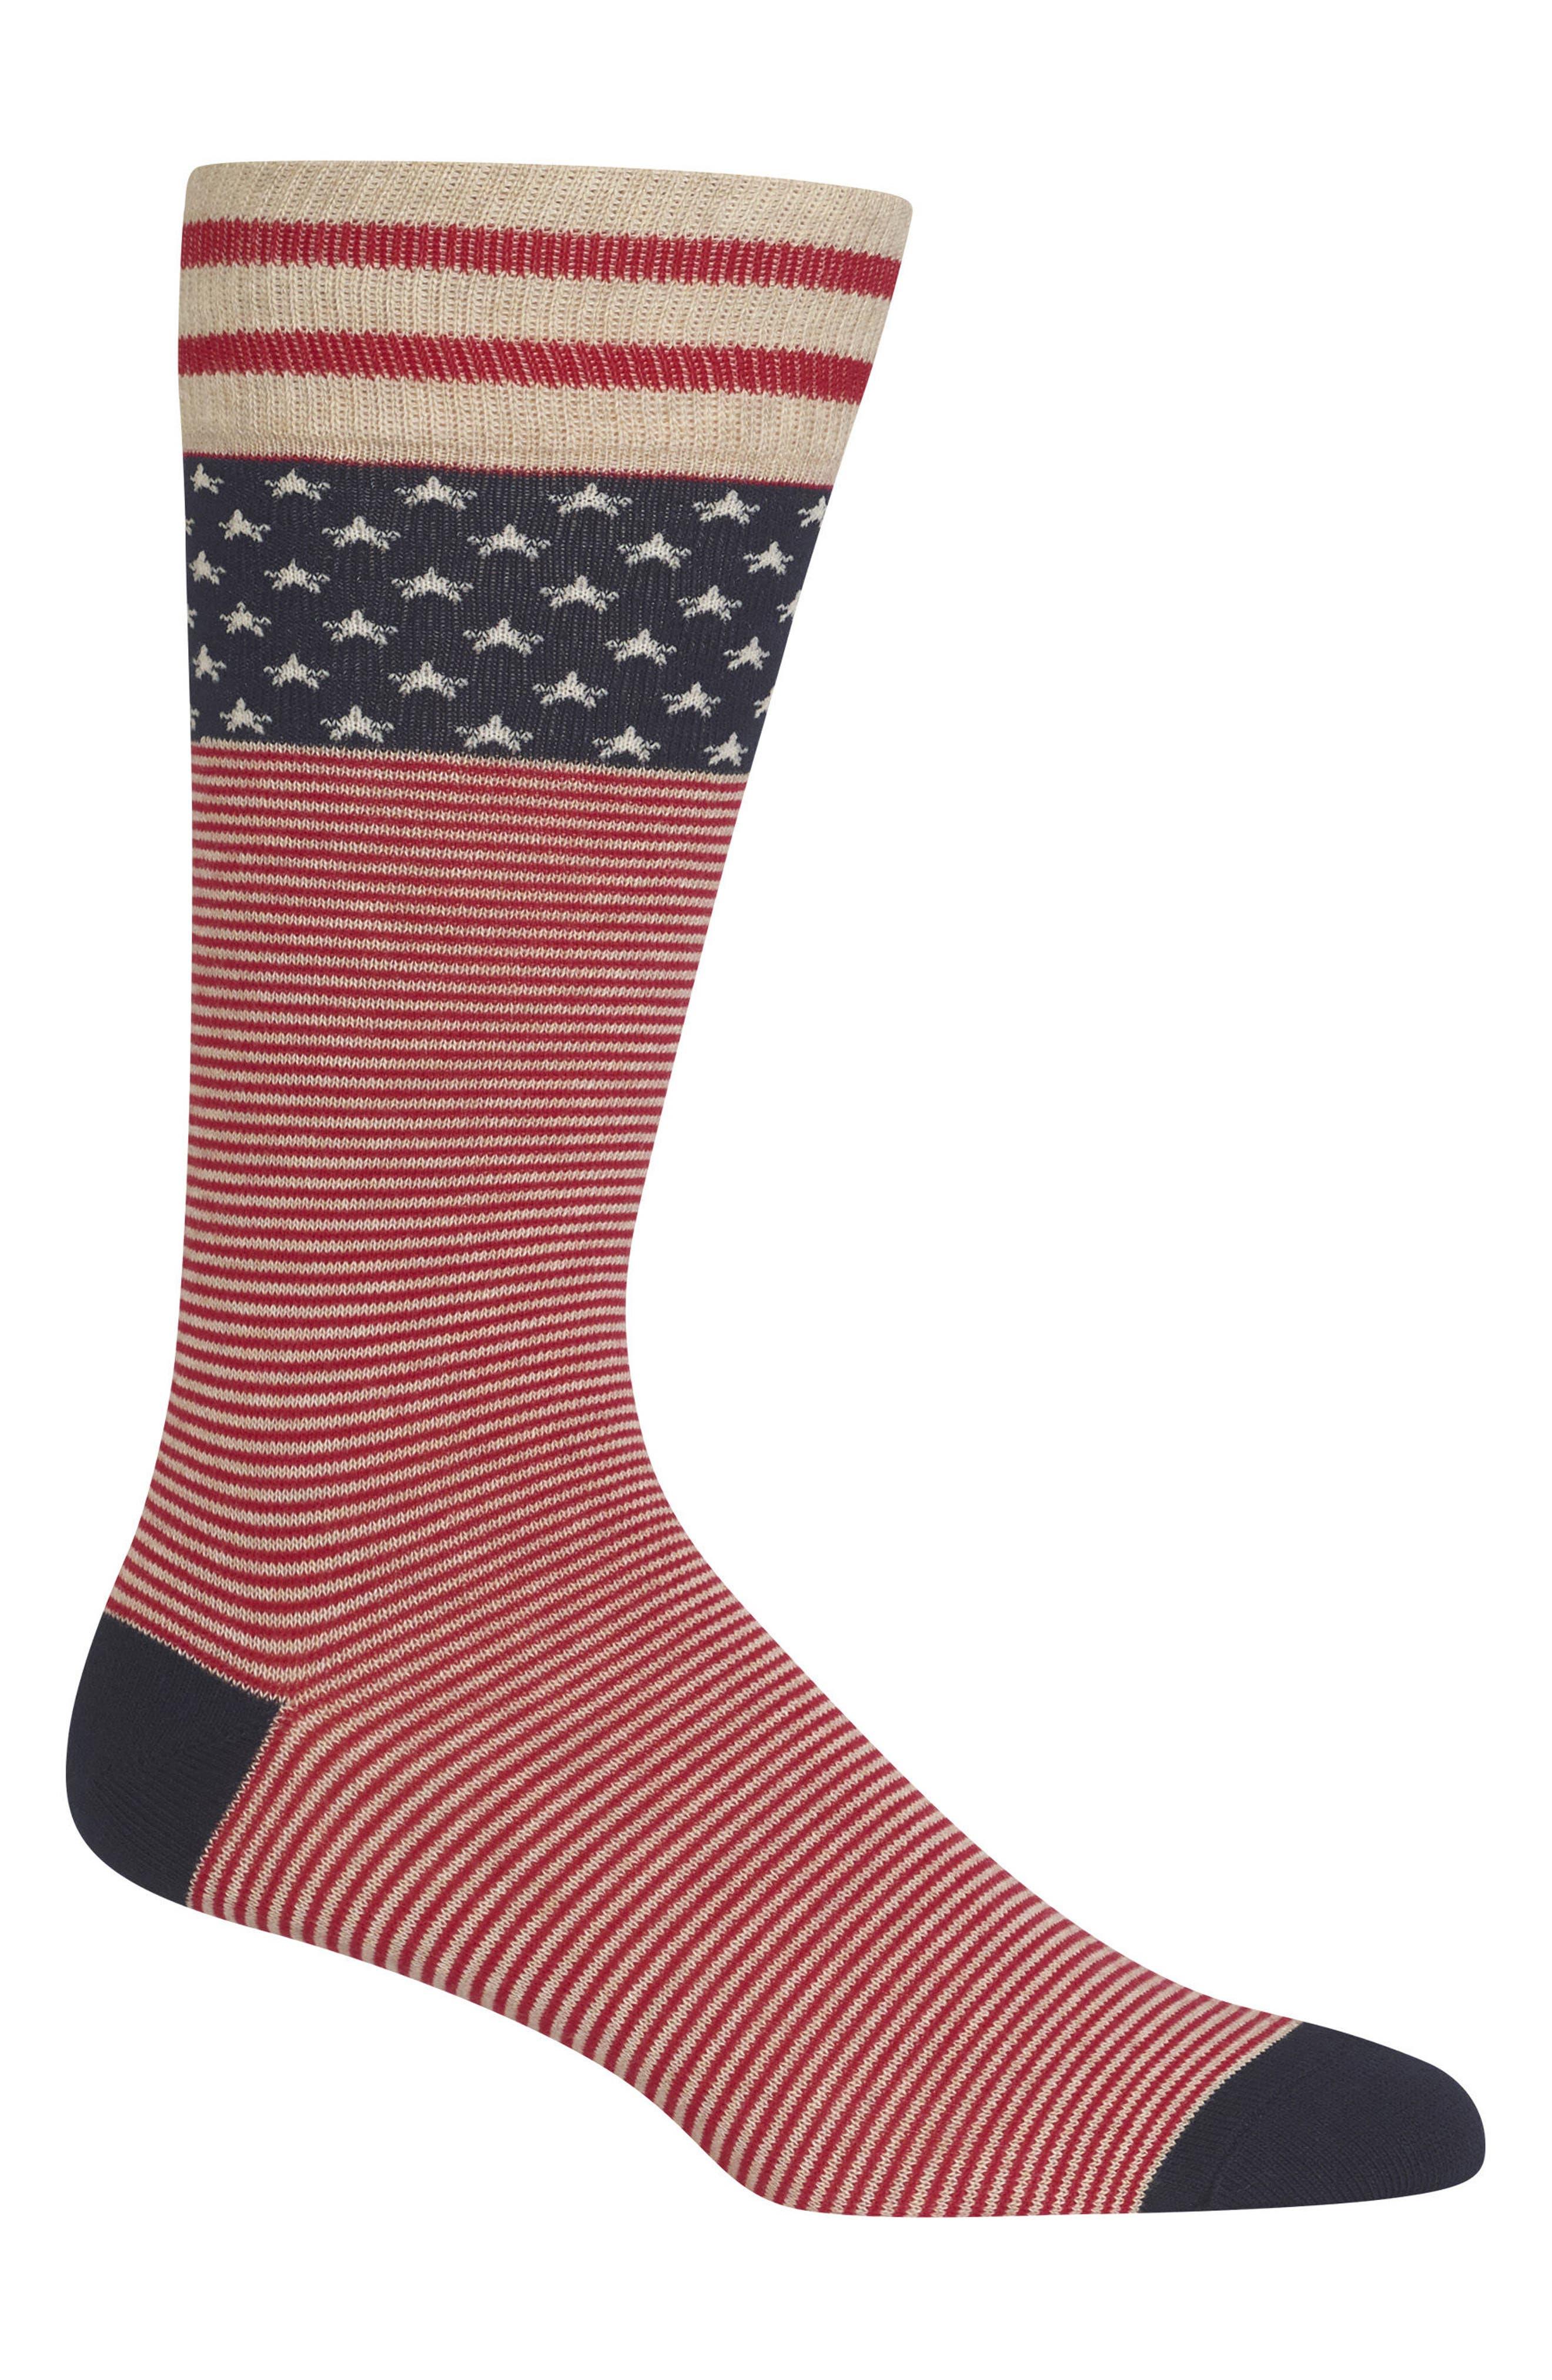 Ralph Lauren American Flag Socks,                             Main thumbnail 1, color,                             OATMEAL HEATHER/ RED/ NAVY